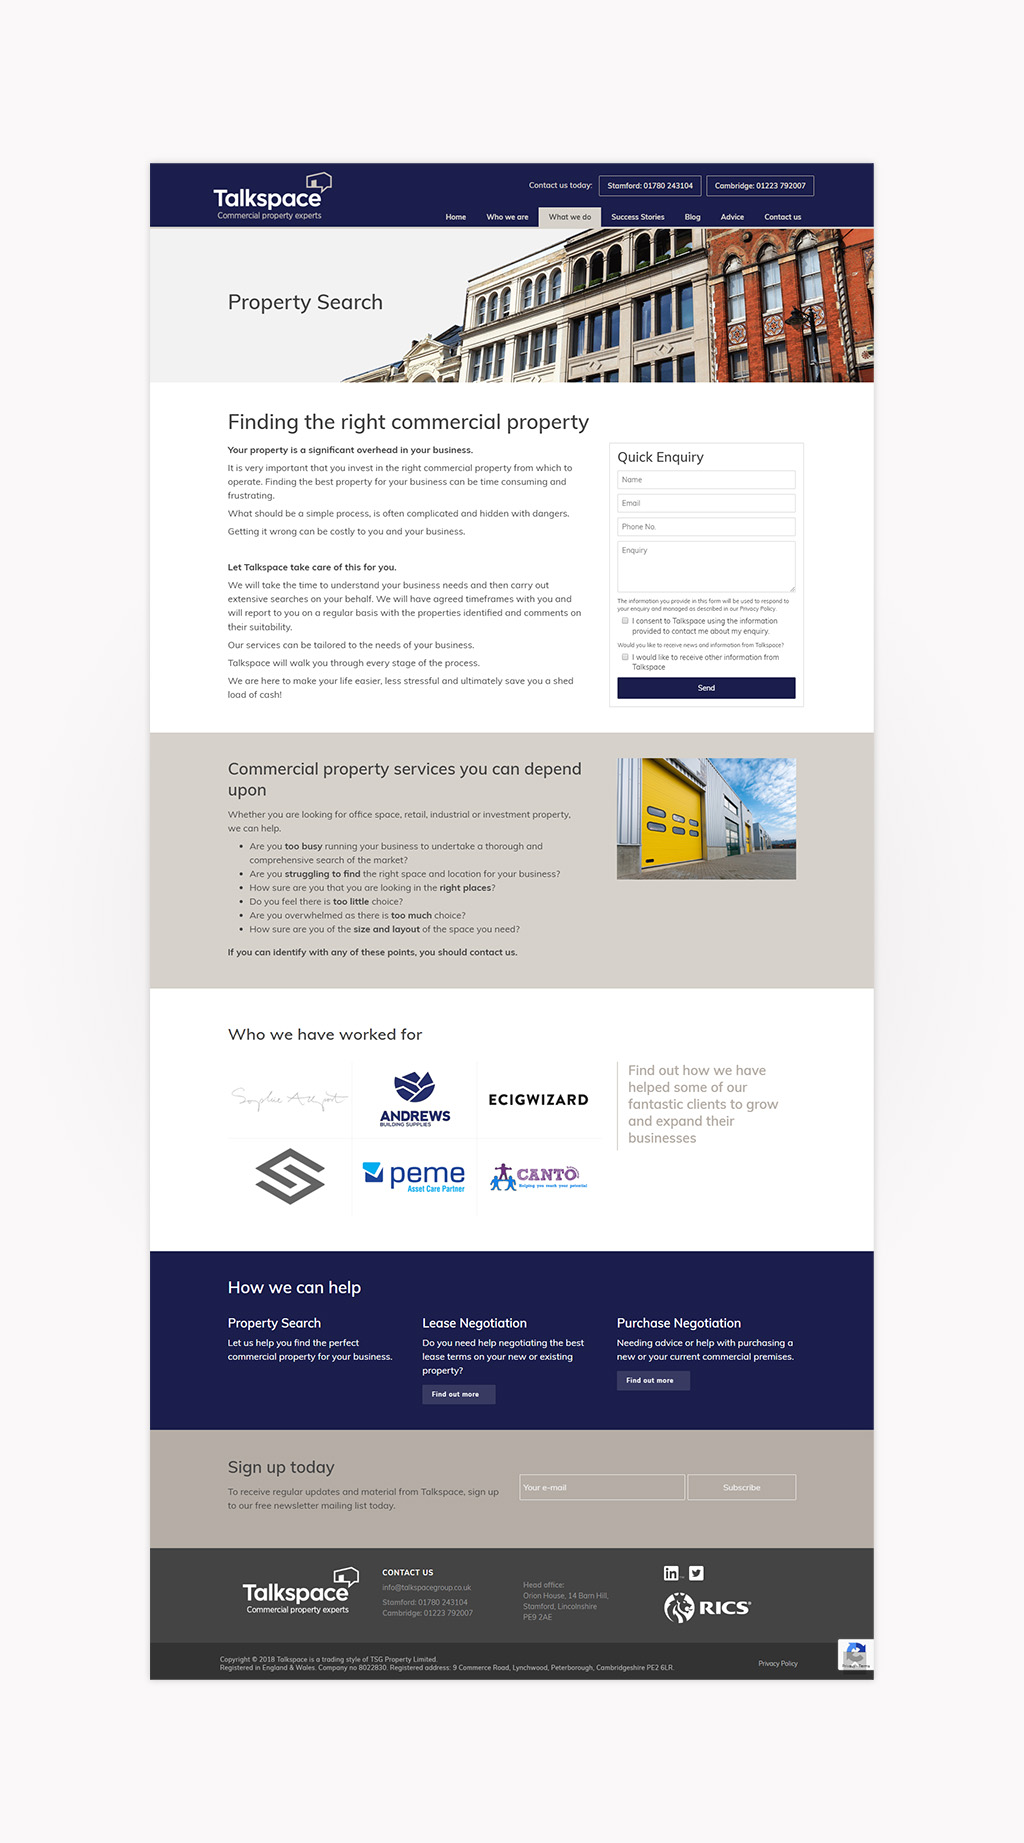 talkspace-website-property-search